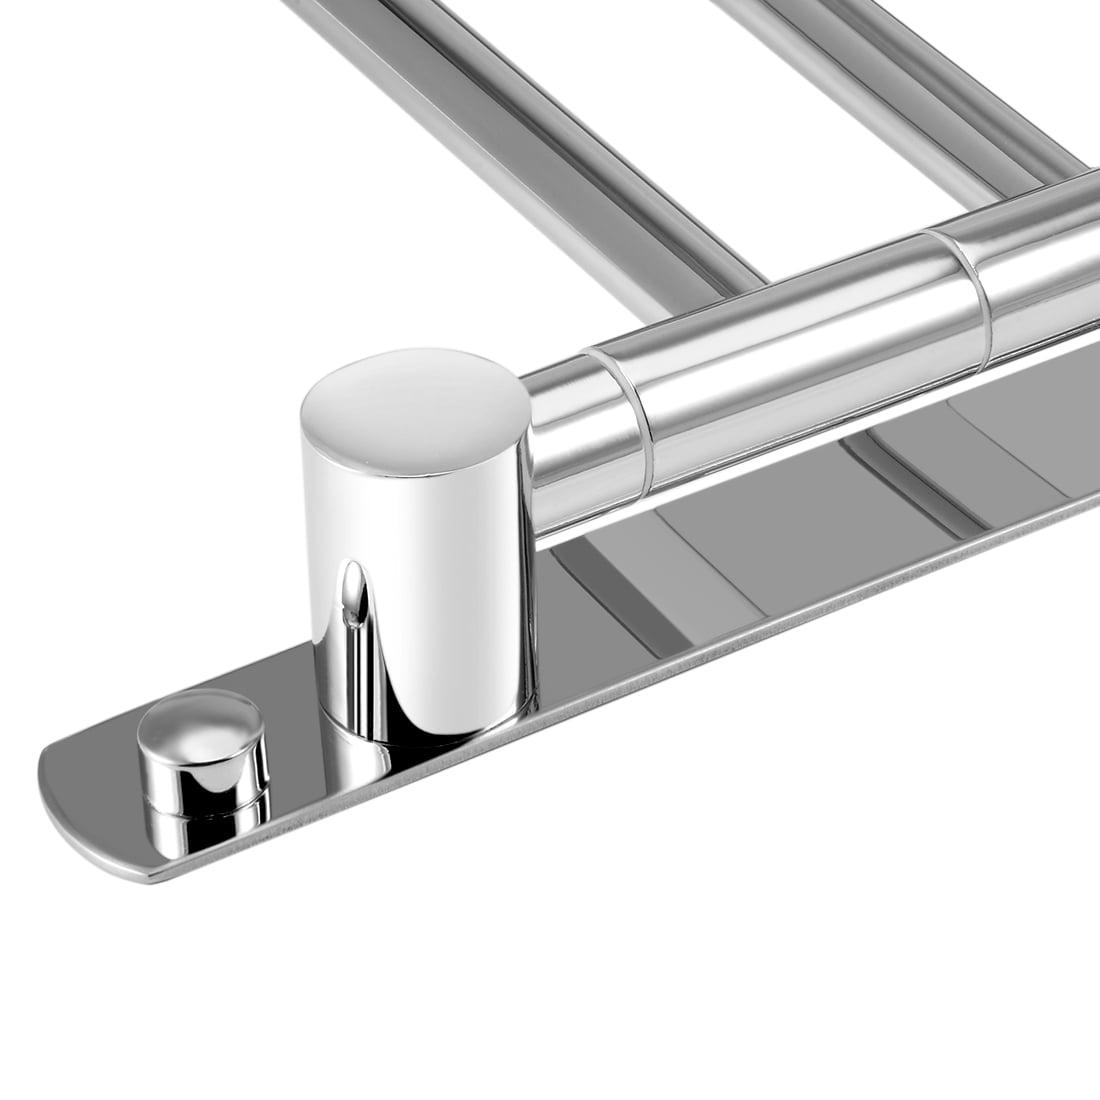 201 Stainless Steel 3 Bar Folding Arm Swivel Hanger Towel Rail Chrome Planted - image 3 of 4